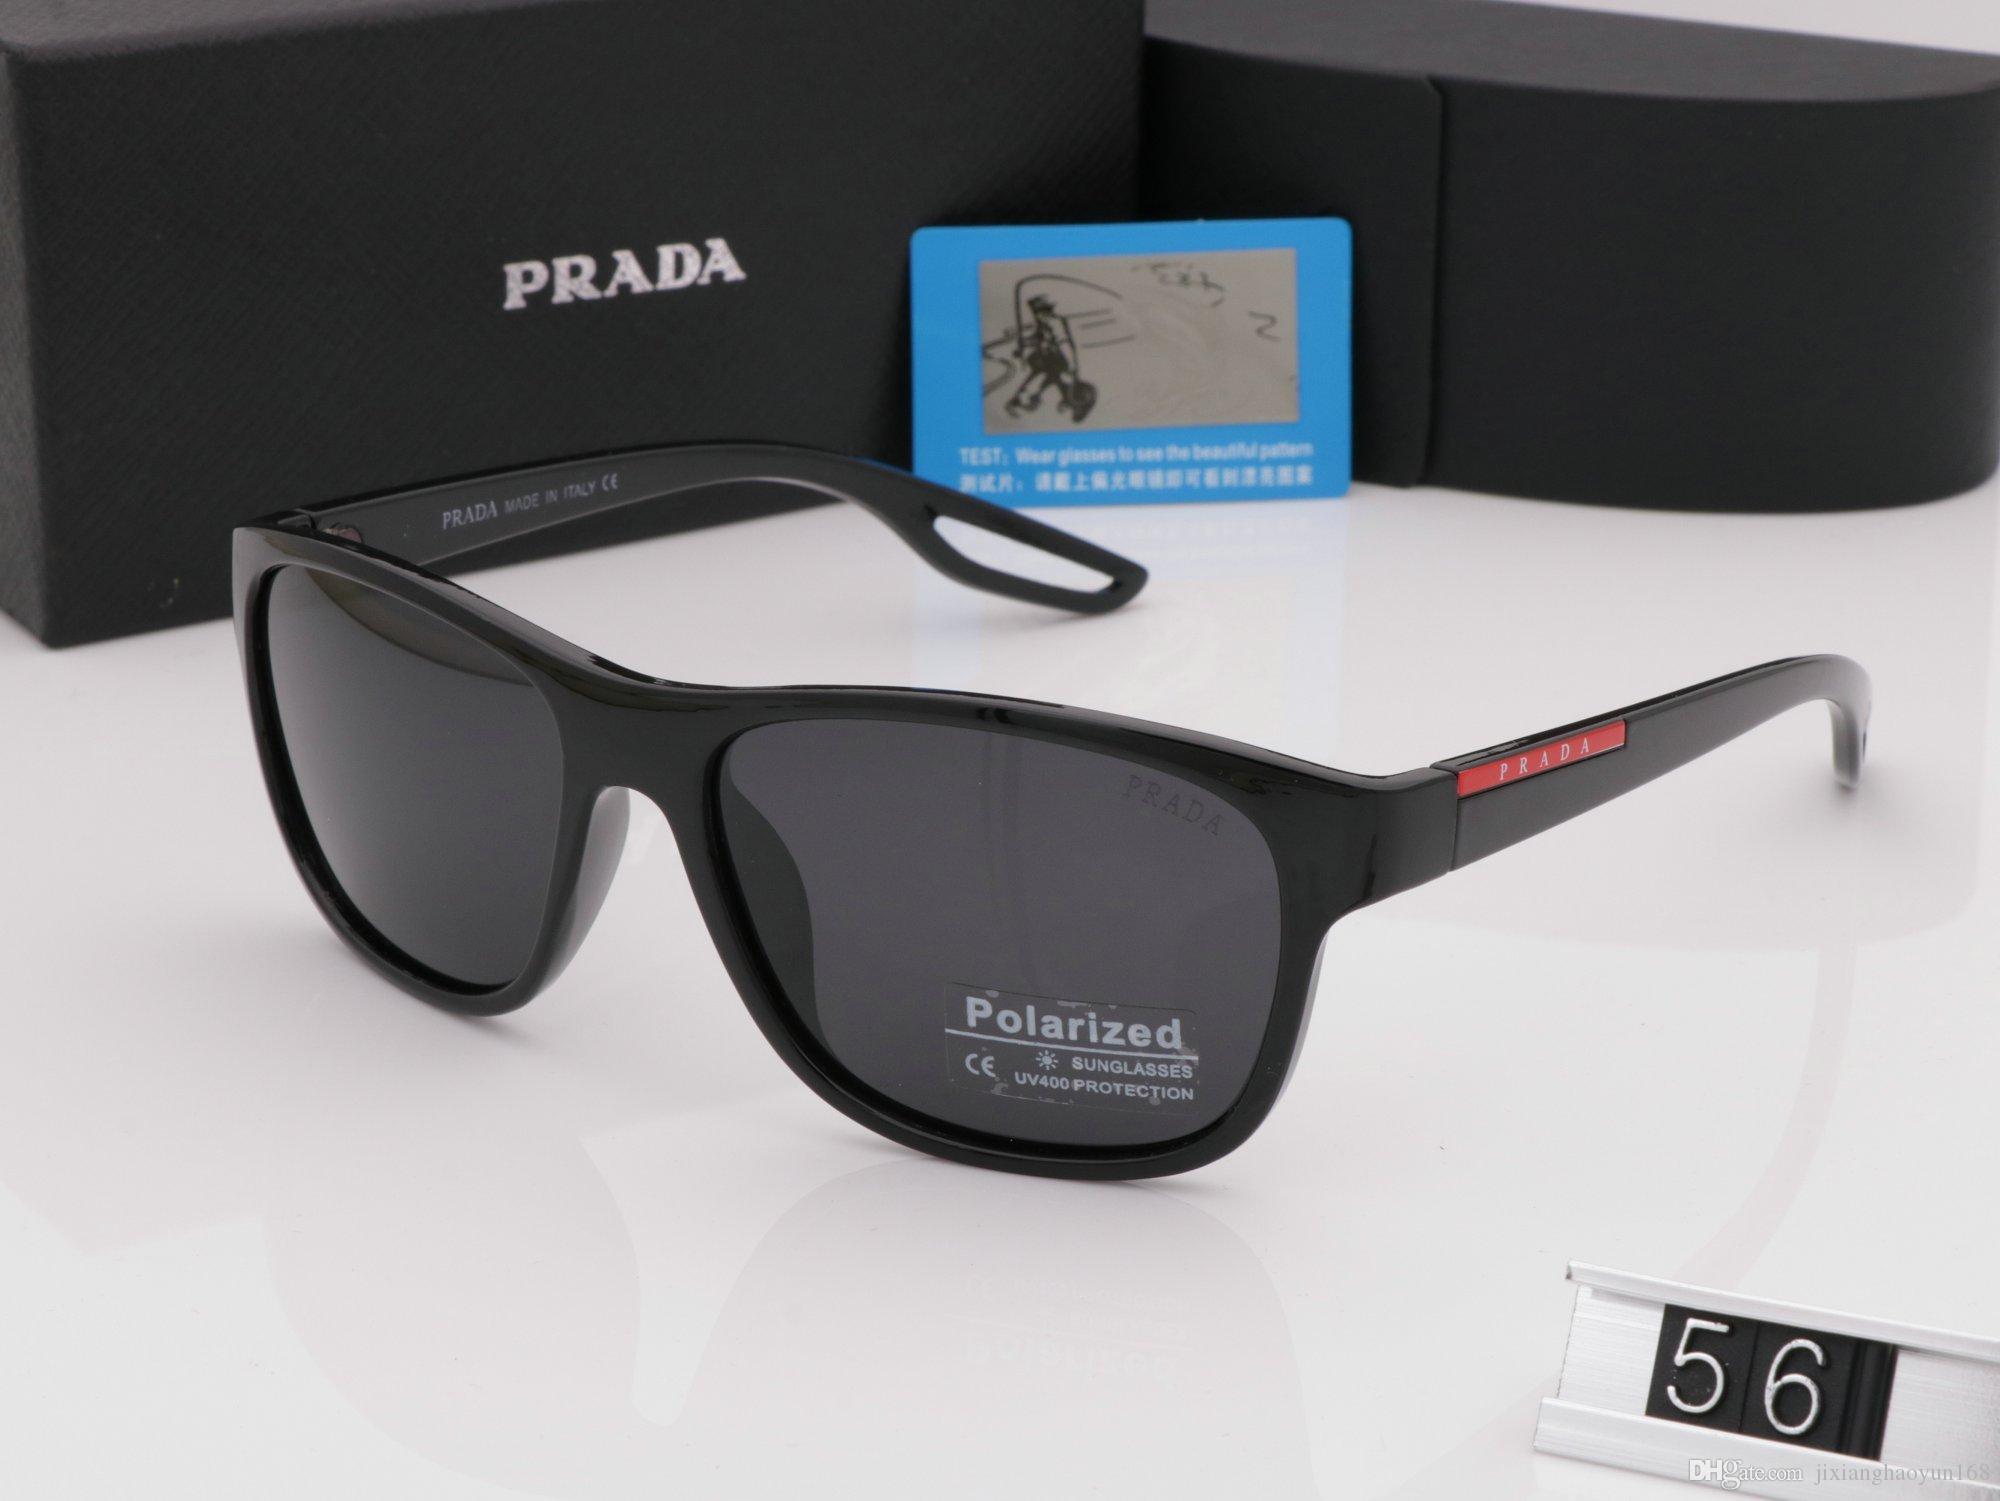 9e8ea1423c 2019 Polarized 56 21 New Fashion Classic Sunglasses Attitude Sunglasses  Frame Square Metal Frame Vintage Style Outdoor Design Classical Model From  ...